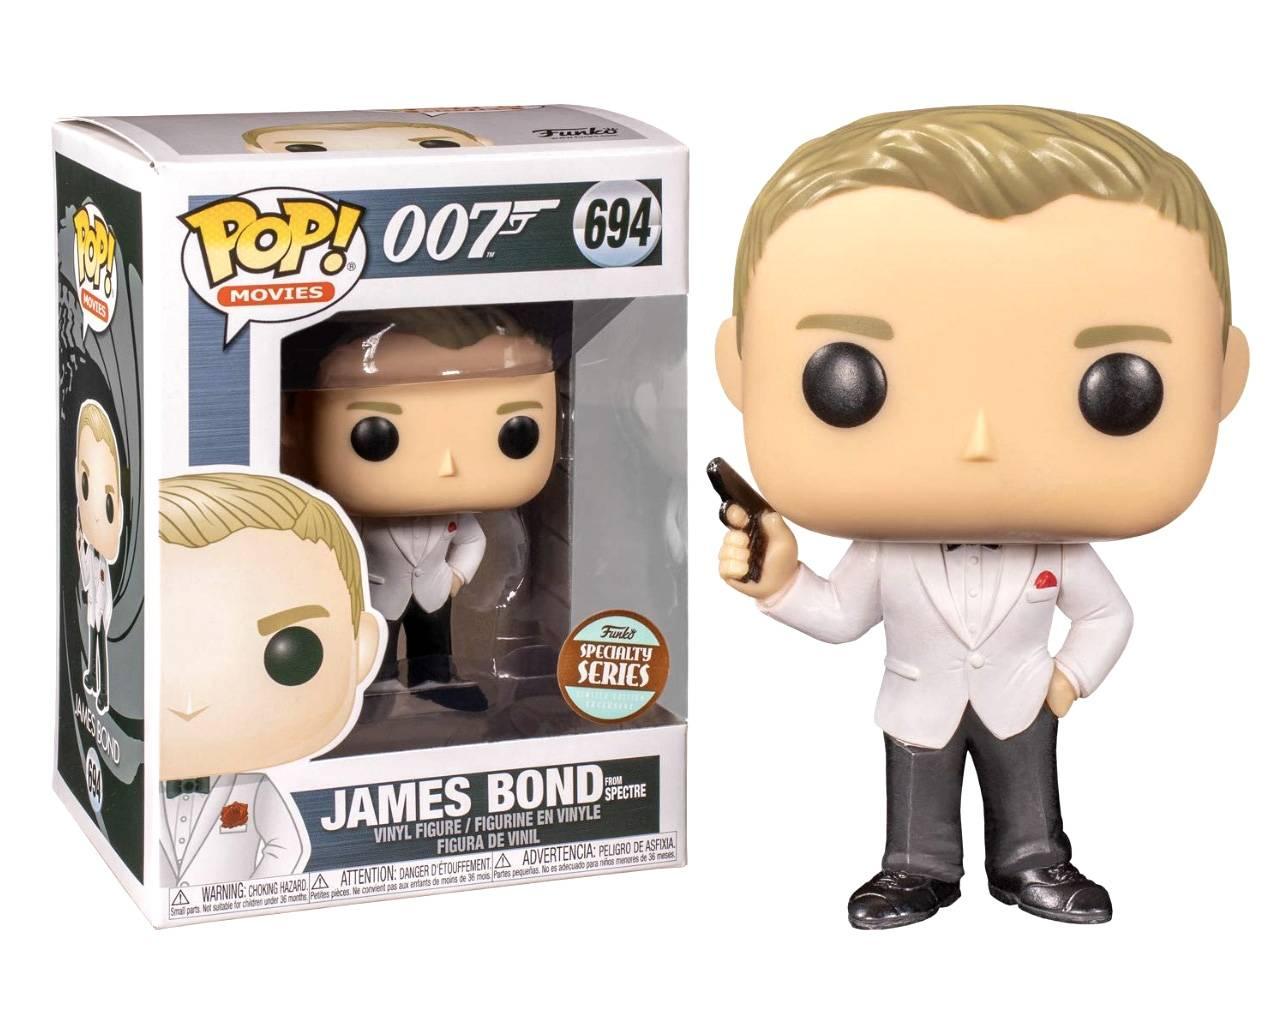 James Bond from Spectre (Specialty Series) Pop! Vinyl